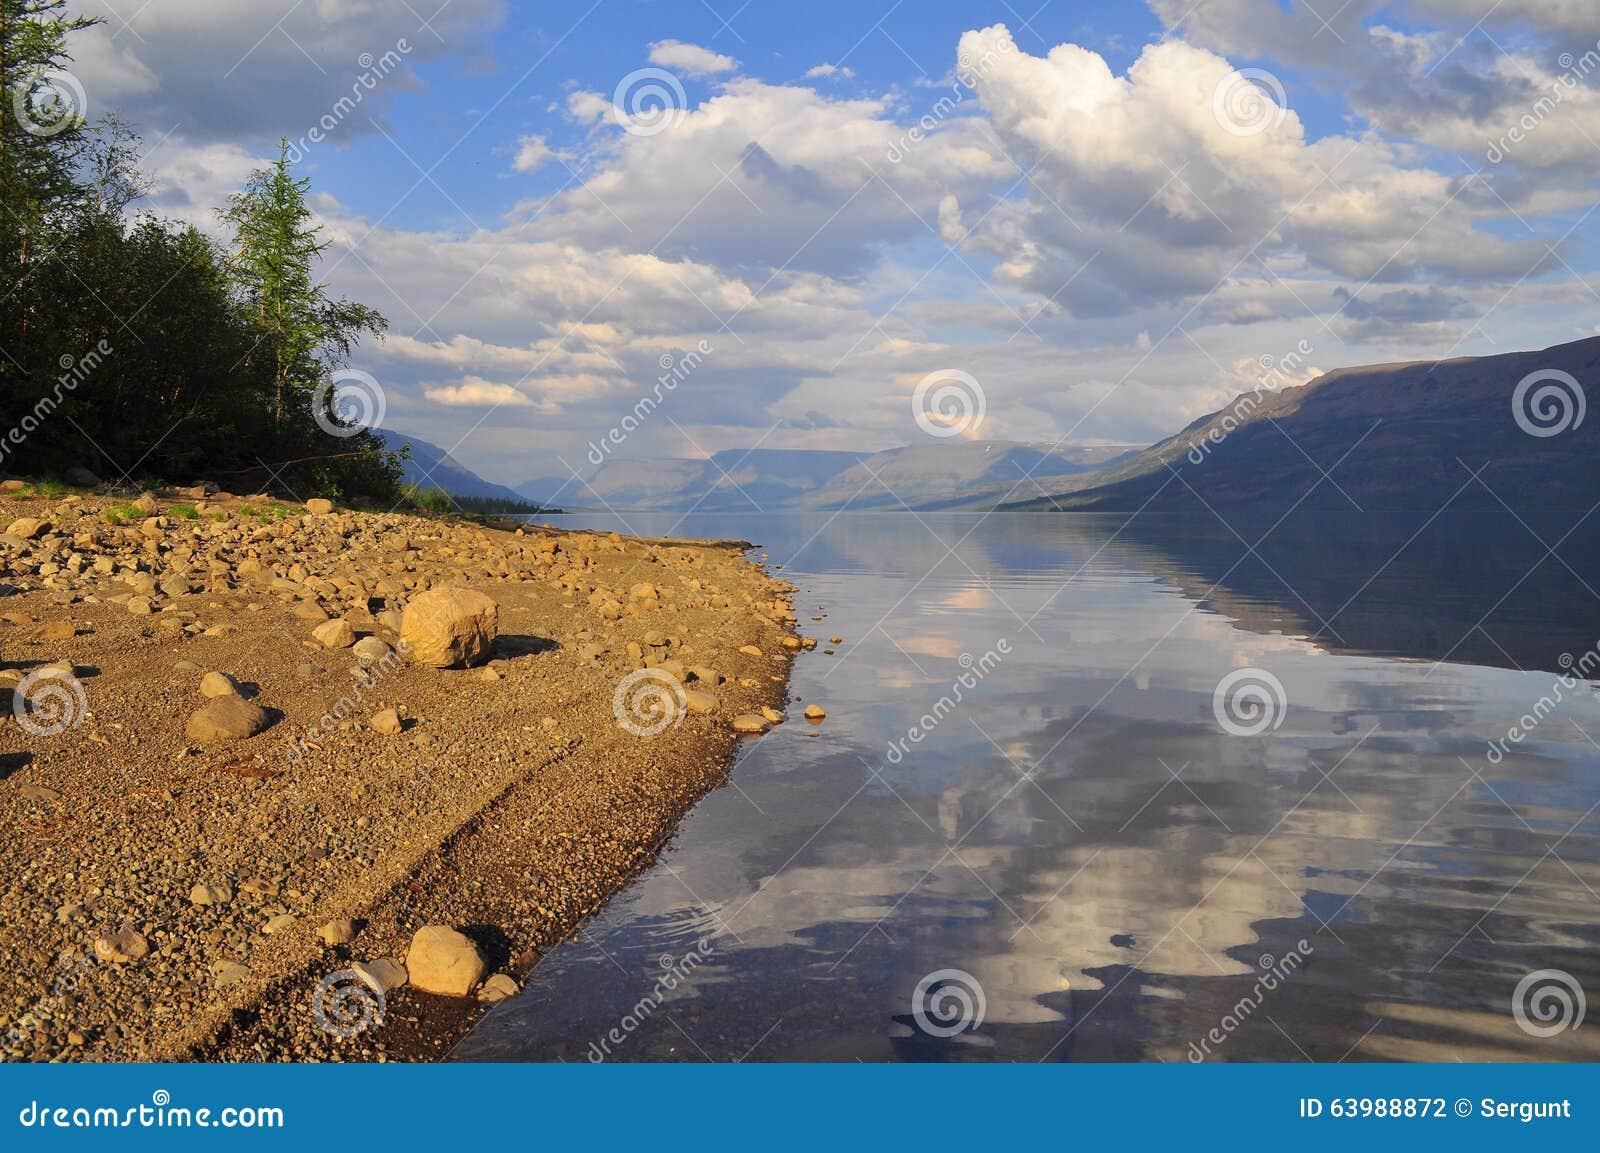 Mountain Lake.